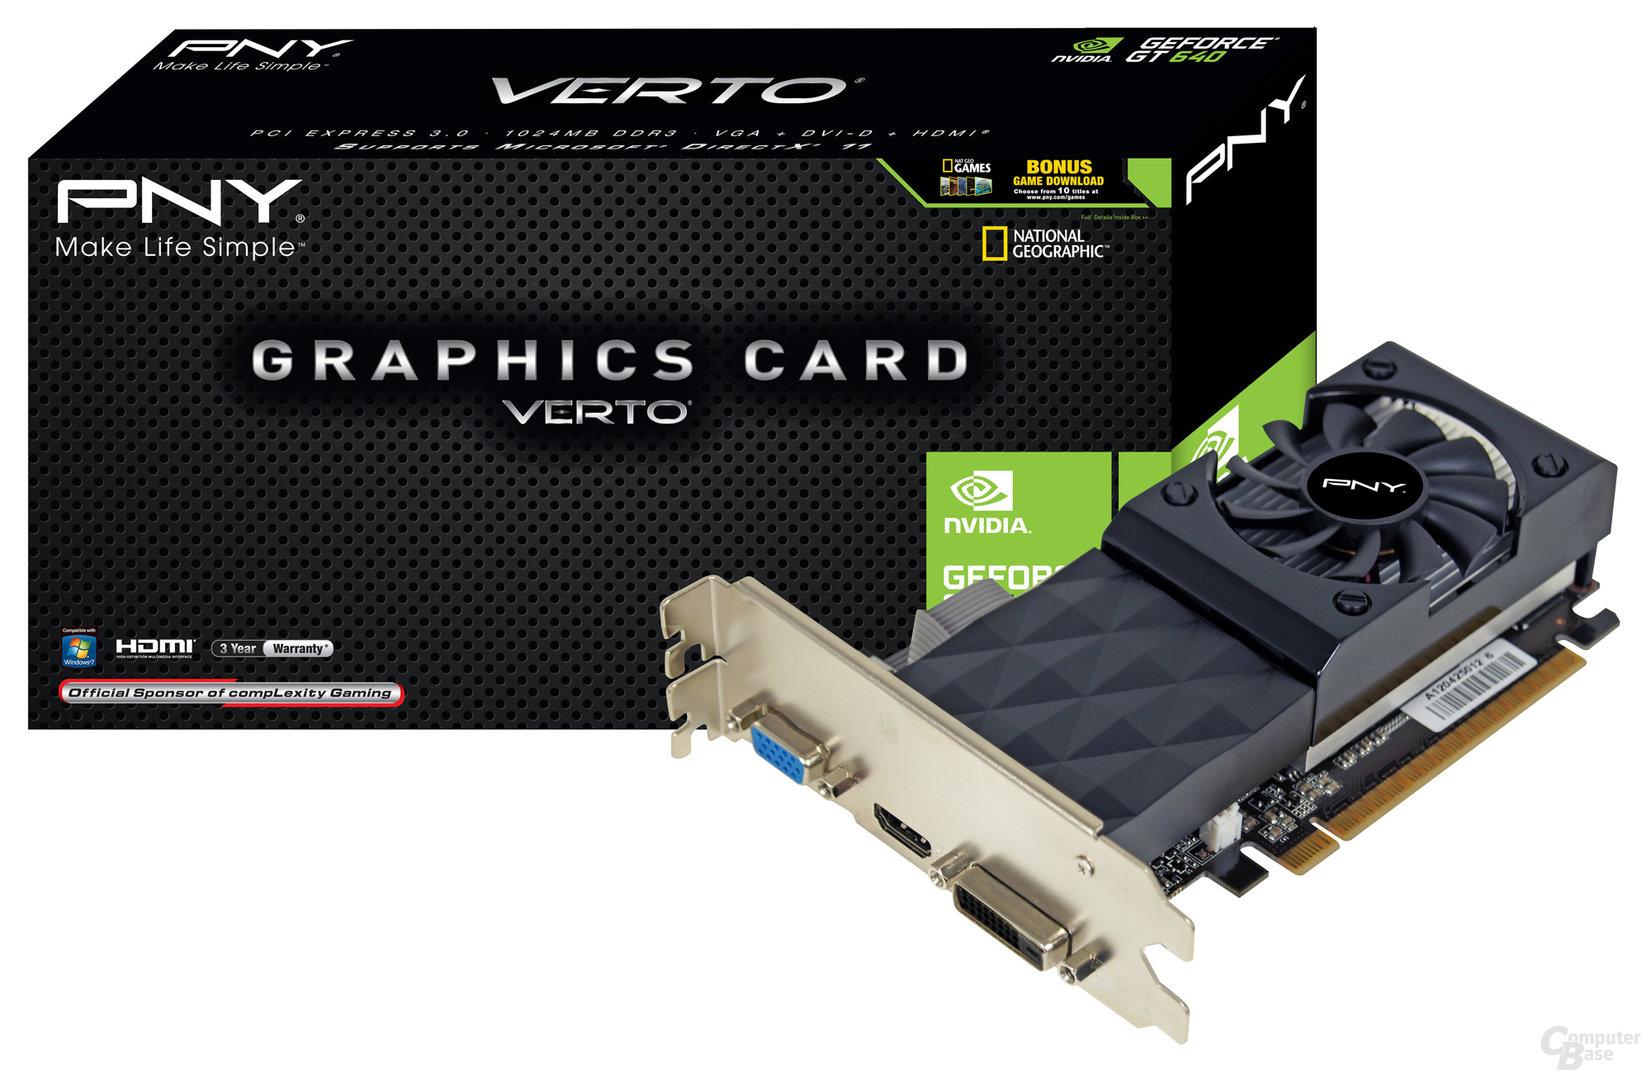 PNY GeForce GT 640